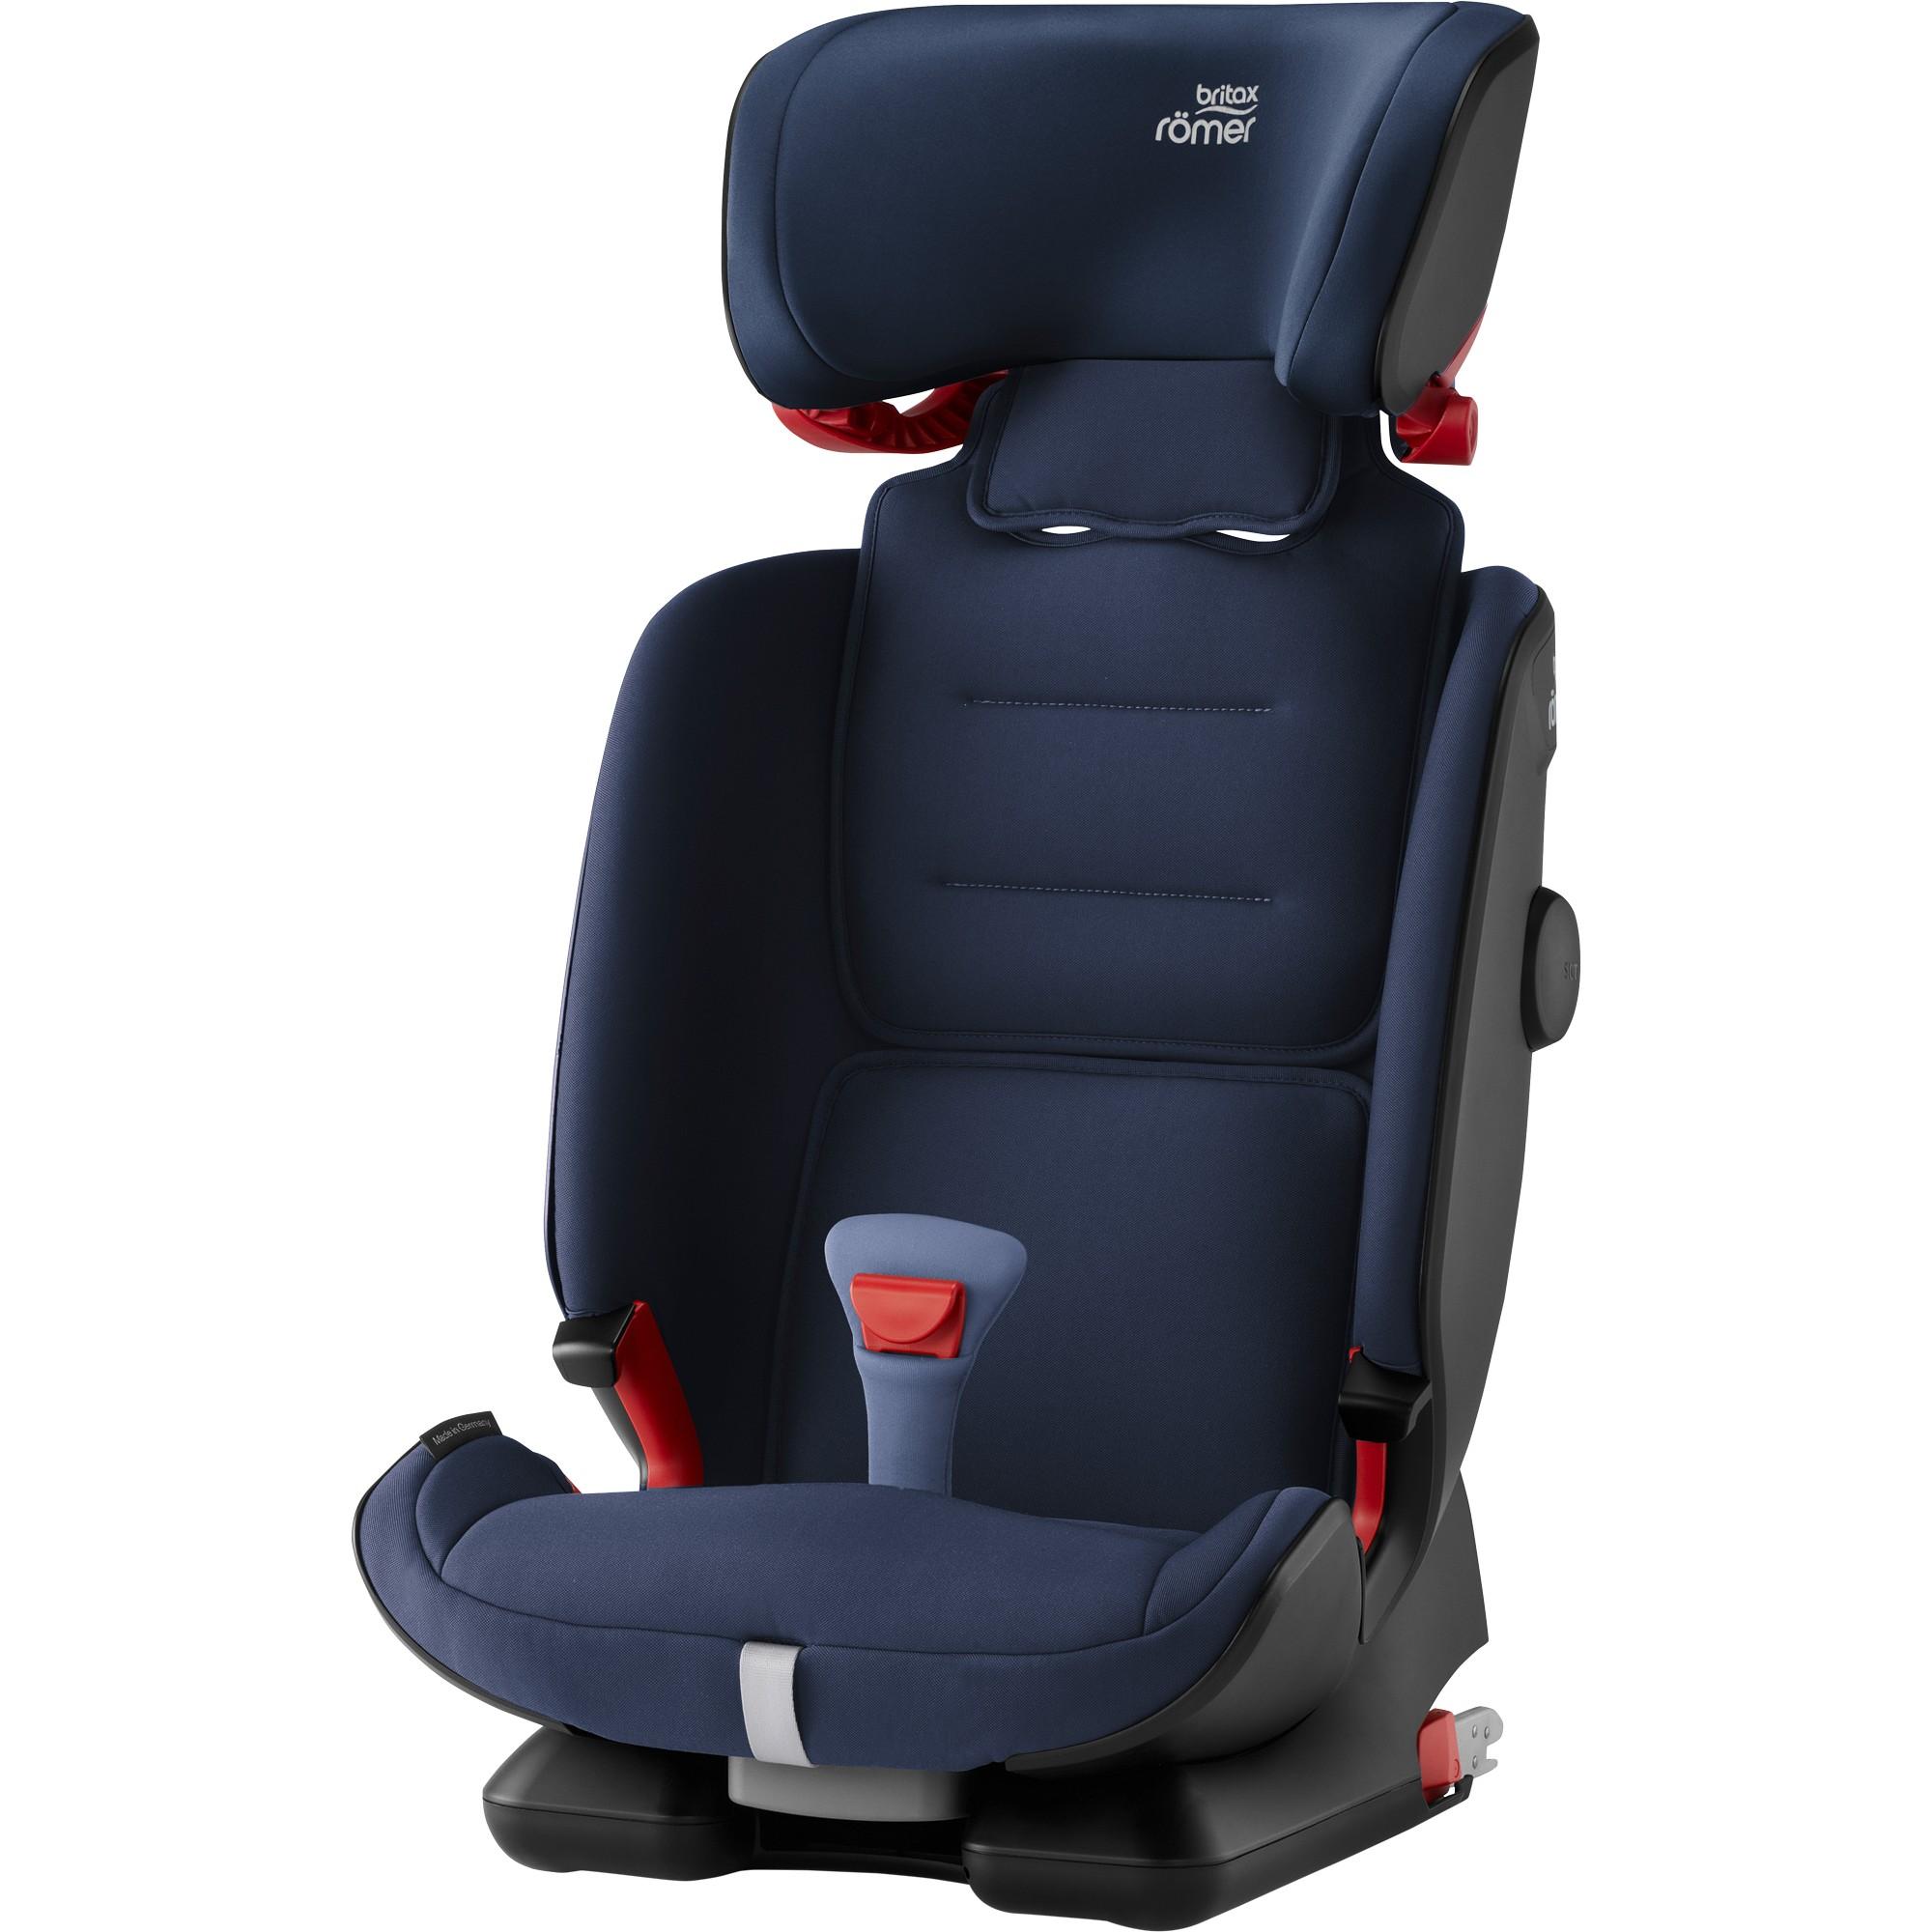 Britax-Romer-ADVANSAFIX-IV-R-Group-1-2-3-Child-Car-Seat thumbnail 7